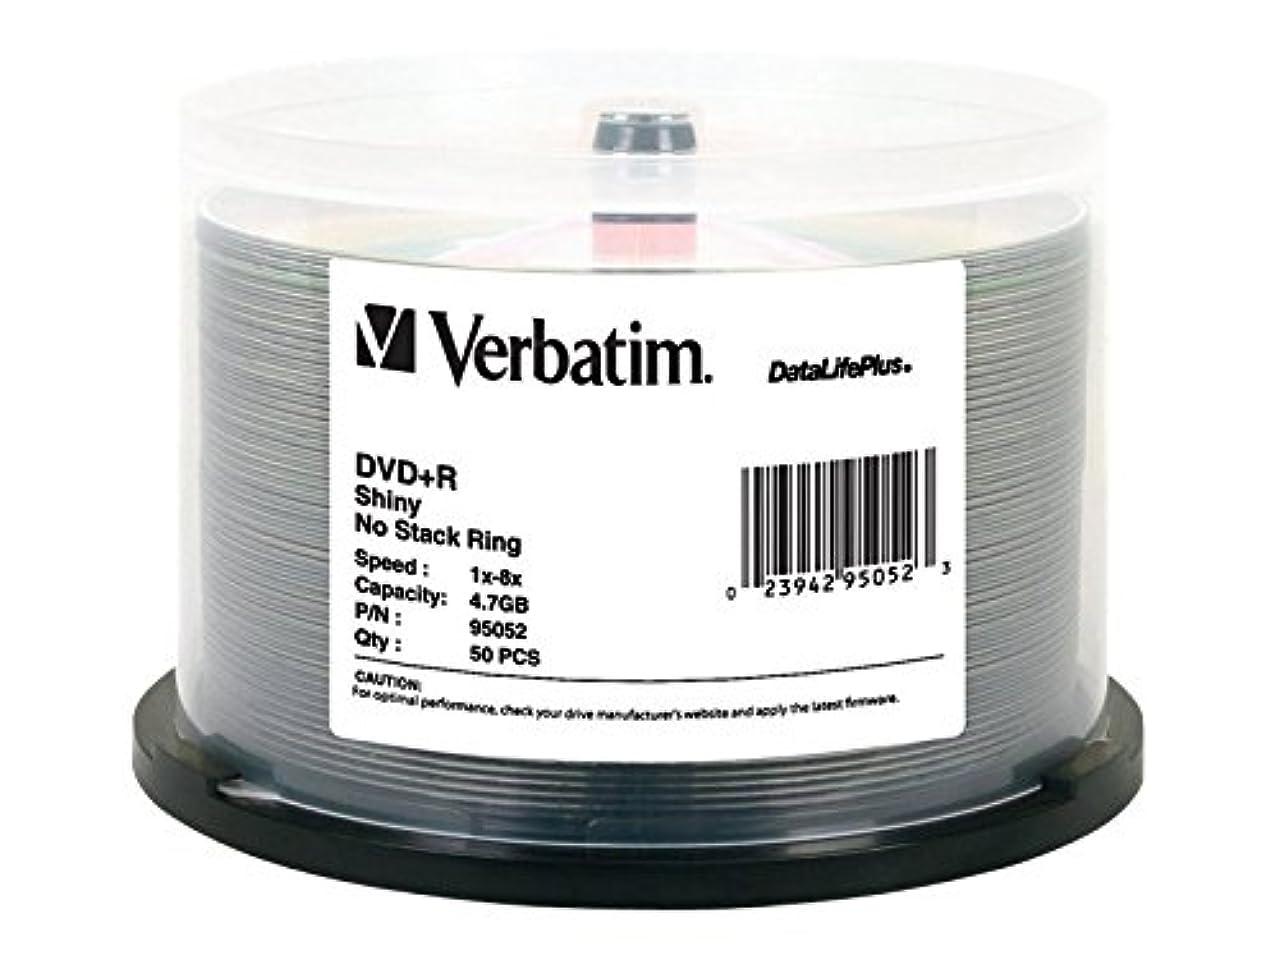 Verbatim DVD+R 4.7GB 8X DataLifePlus Shiny Silver Silk Screen Printable - 50pk Spindle